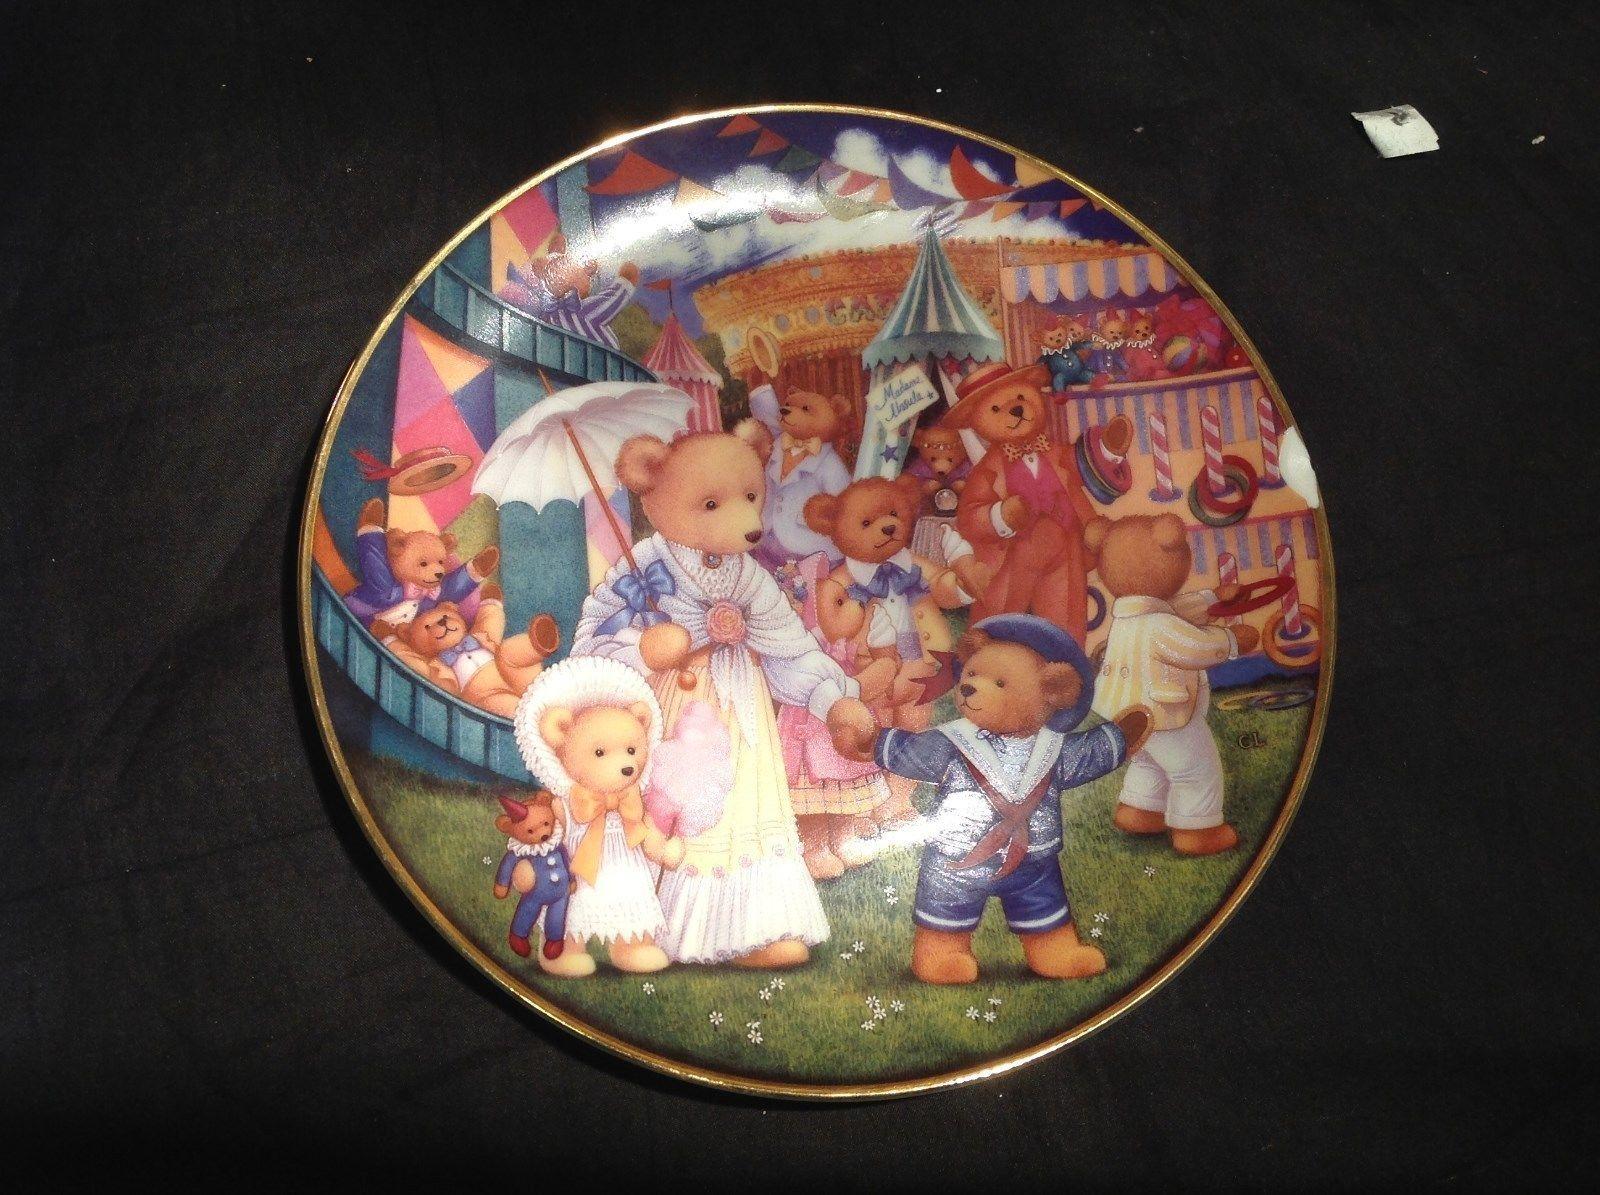 Teddy Bear Fair Limited Edition Porcelain Plate by Carol Lawson Franklin Mint